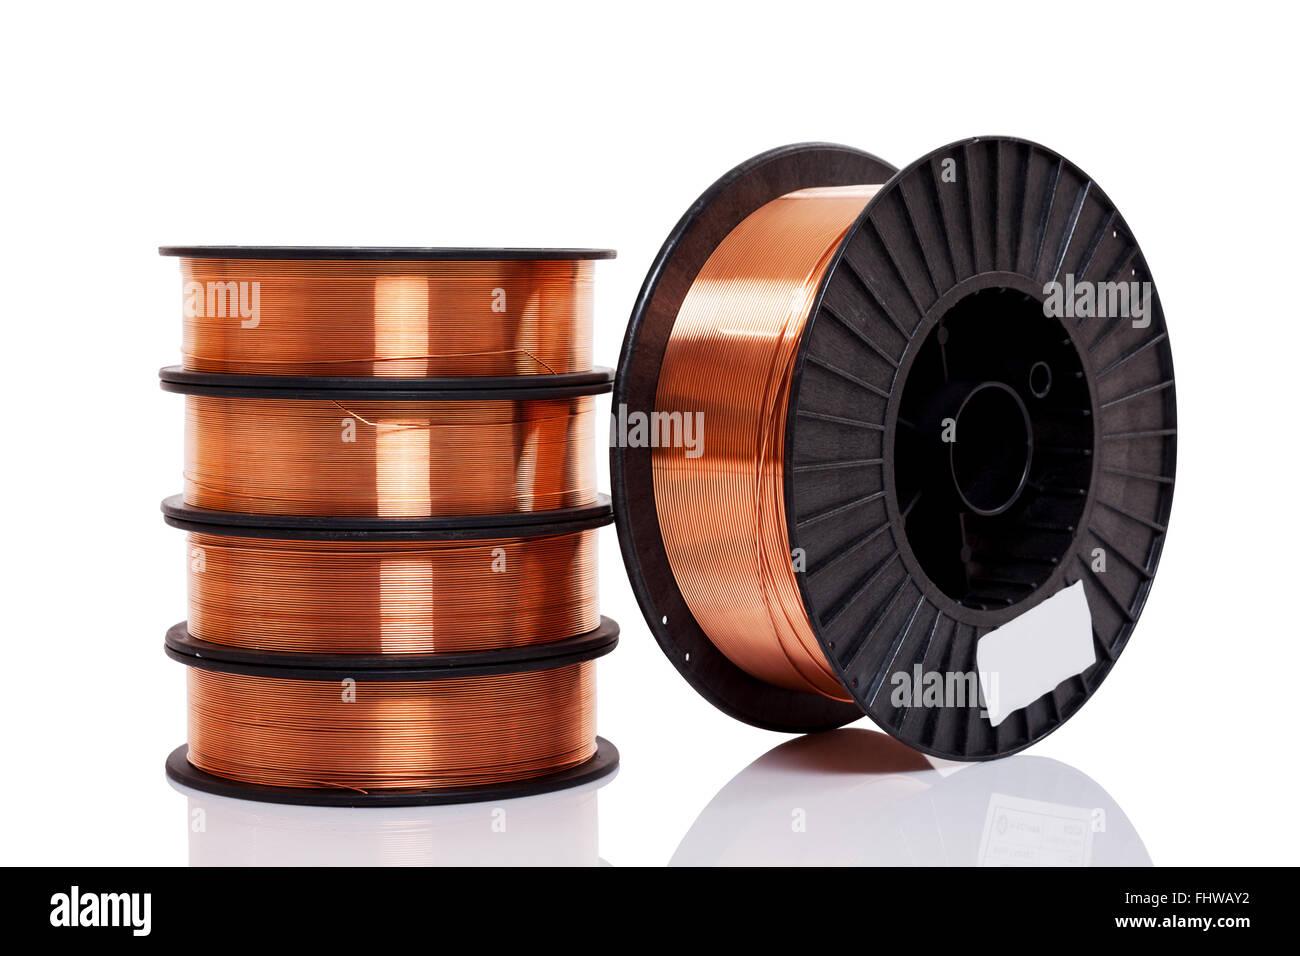 Metal Spools Stockfotos & Metal Spools Bilder - Alamy